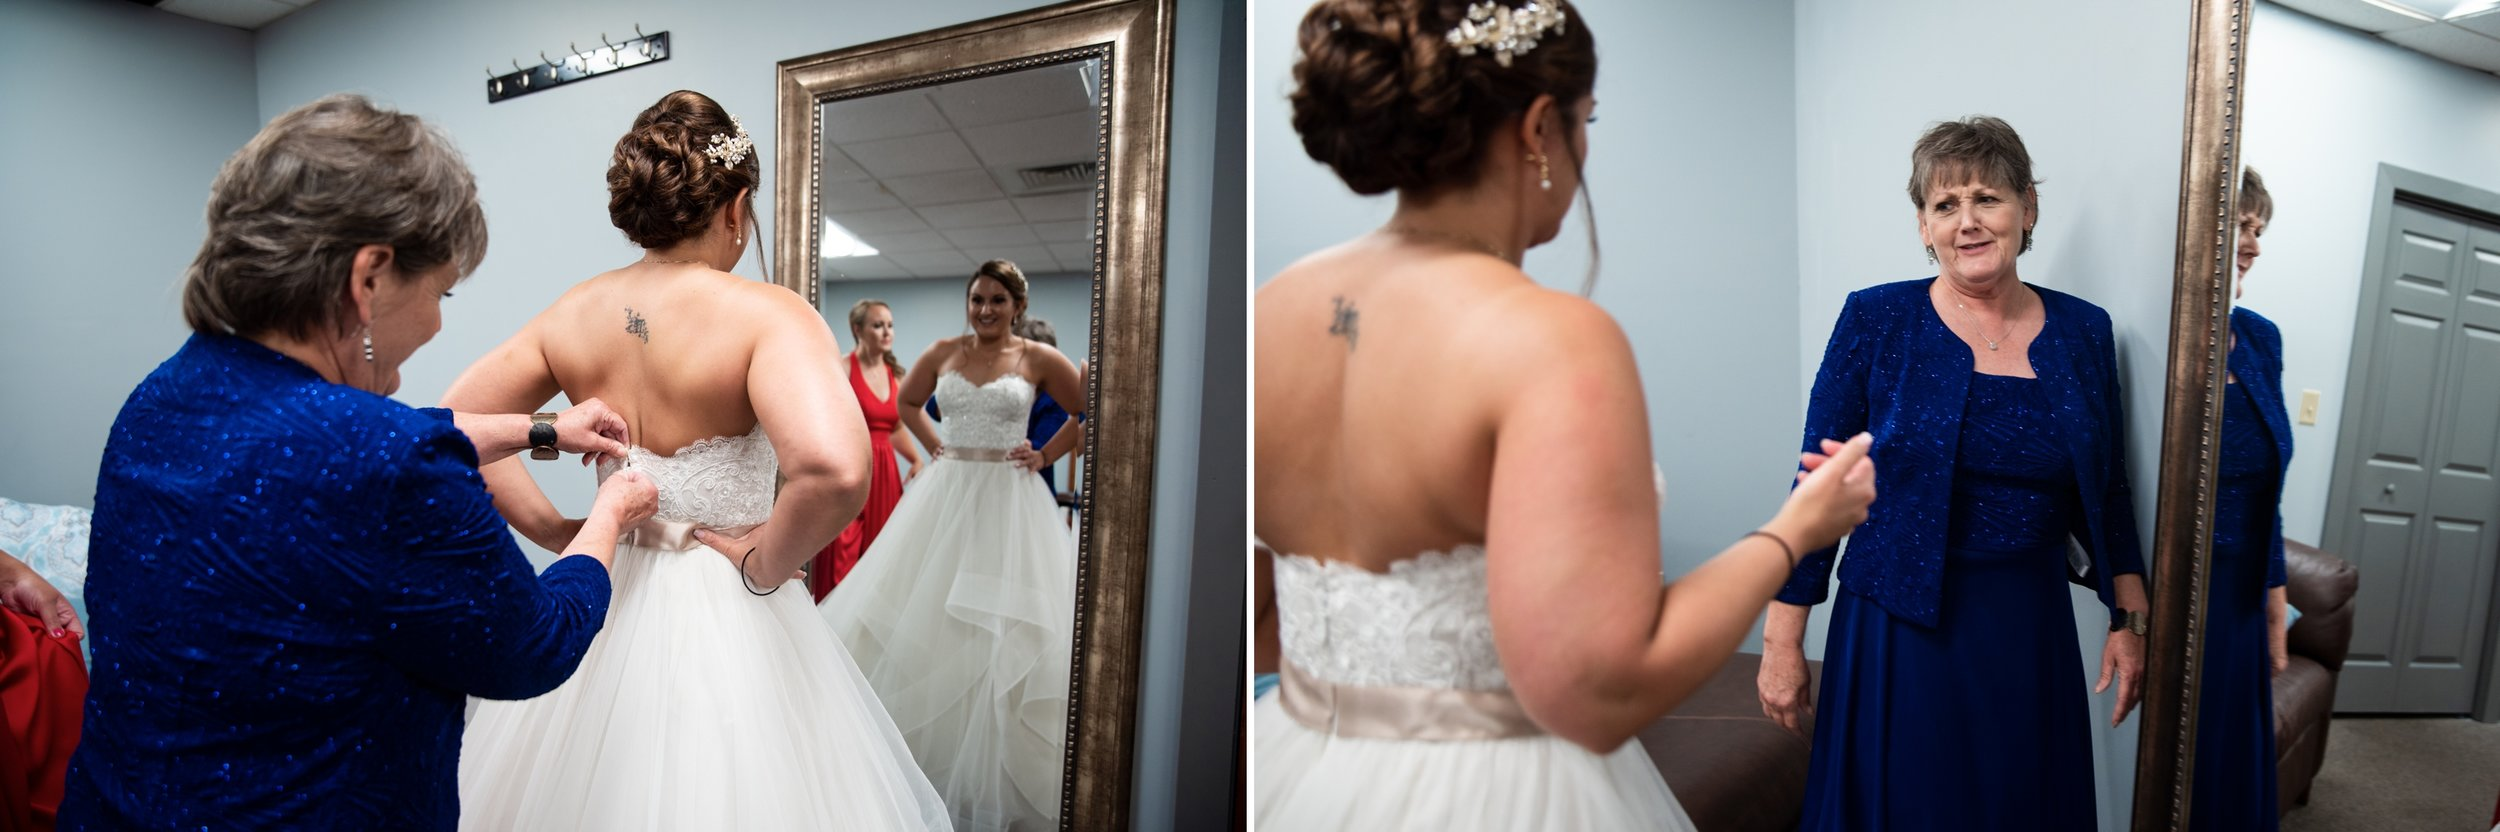 High Vista Wedding - Asheville Vendors  27.jpg